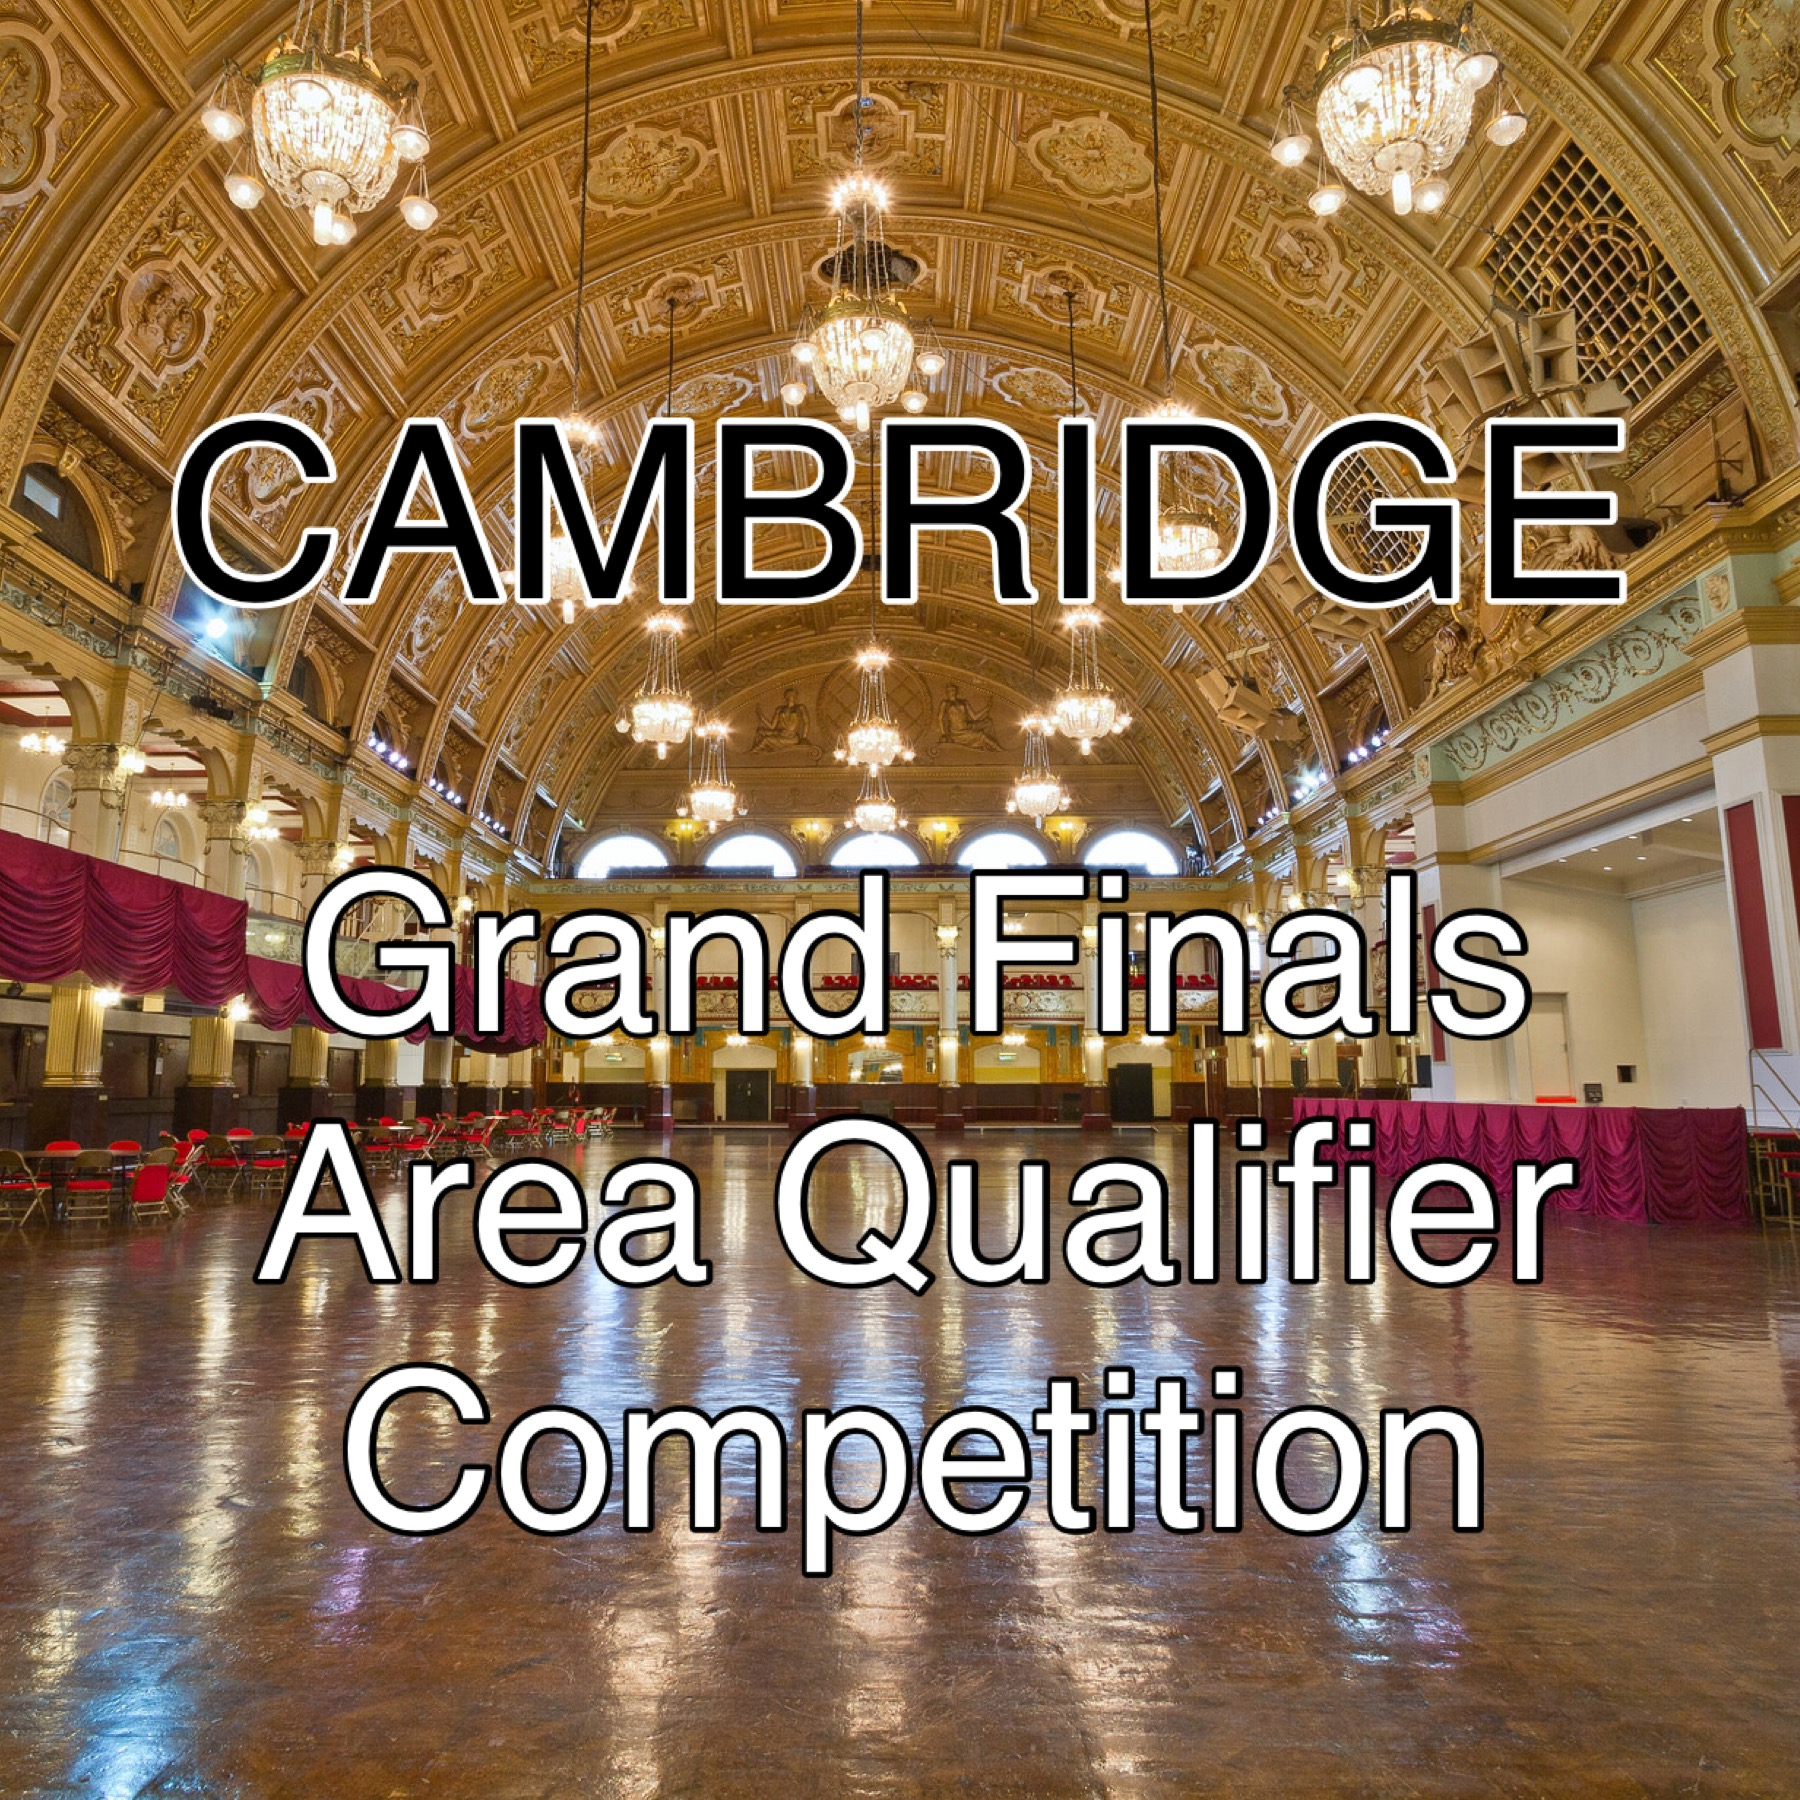 Cambridge Grand Finals Area Qualifier